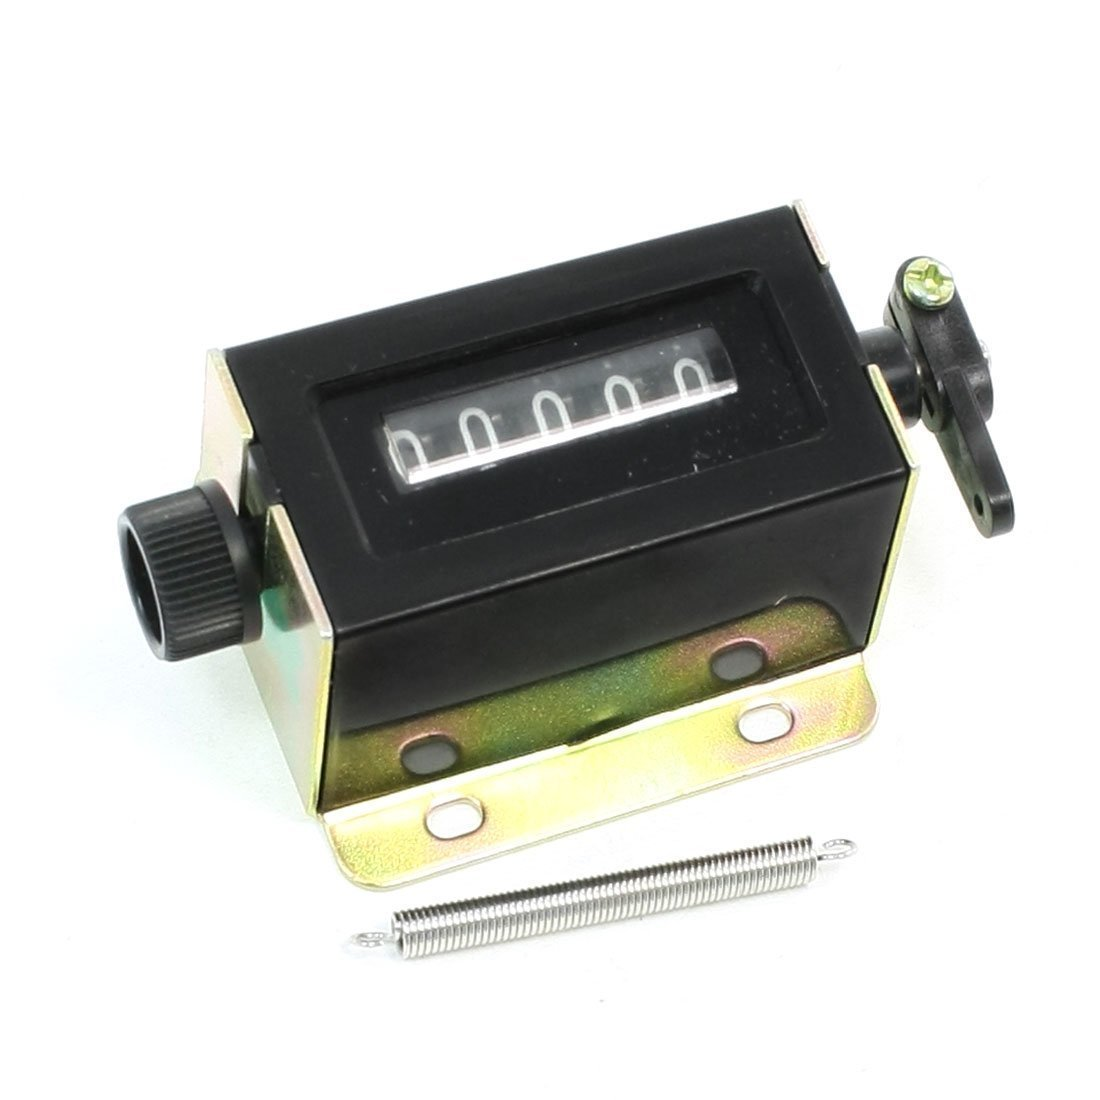 GUWANJI D67-F 5 Digits Resettable Stroke Pulling Pull Counter